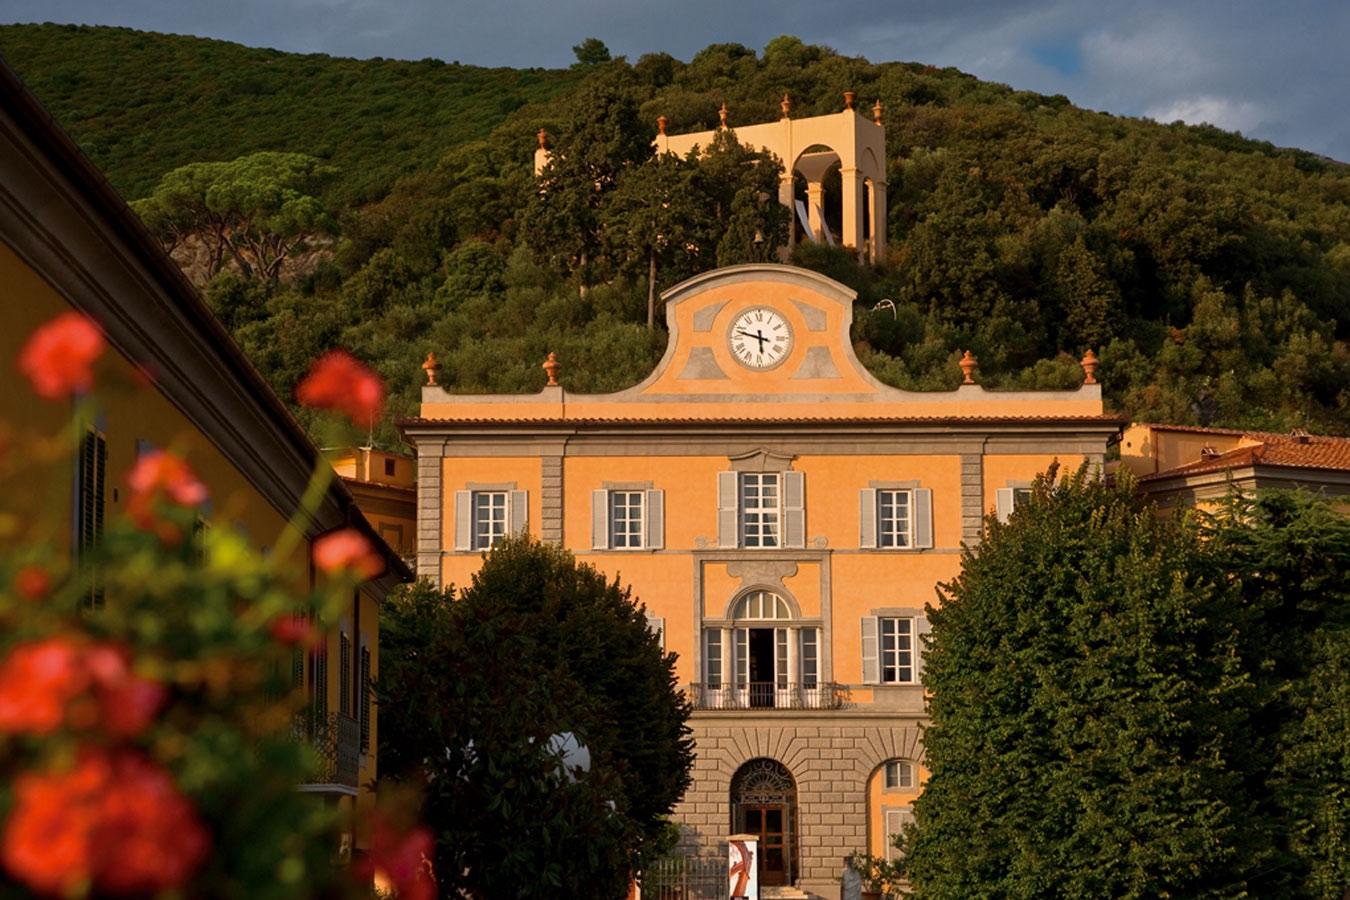 https://www.theluxuryspaedit.com/wp-content/uploads/formidable/6/Bagni-di-Pisa-Palace-Exterior.jpg